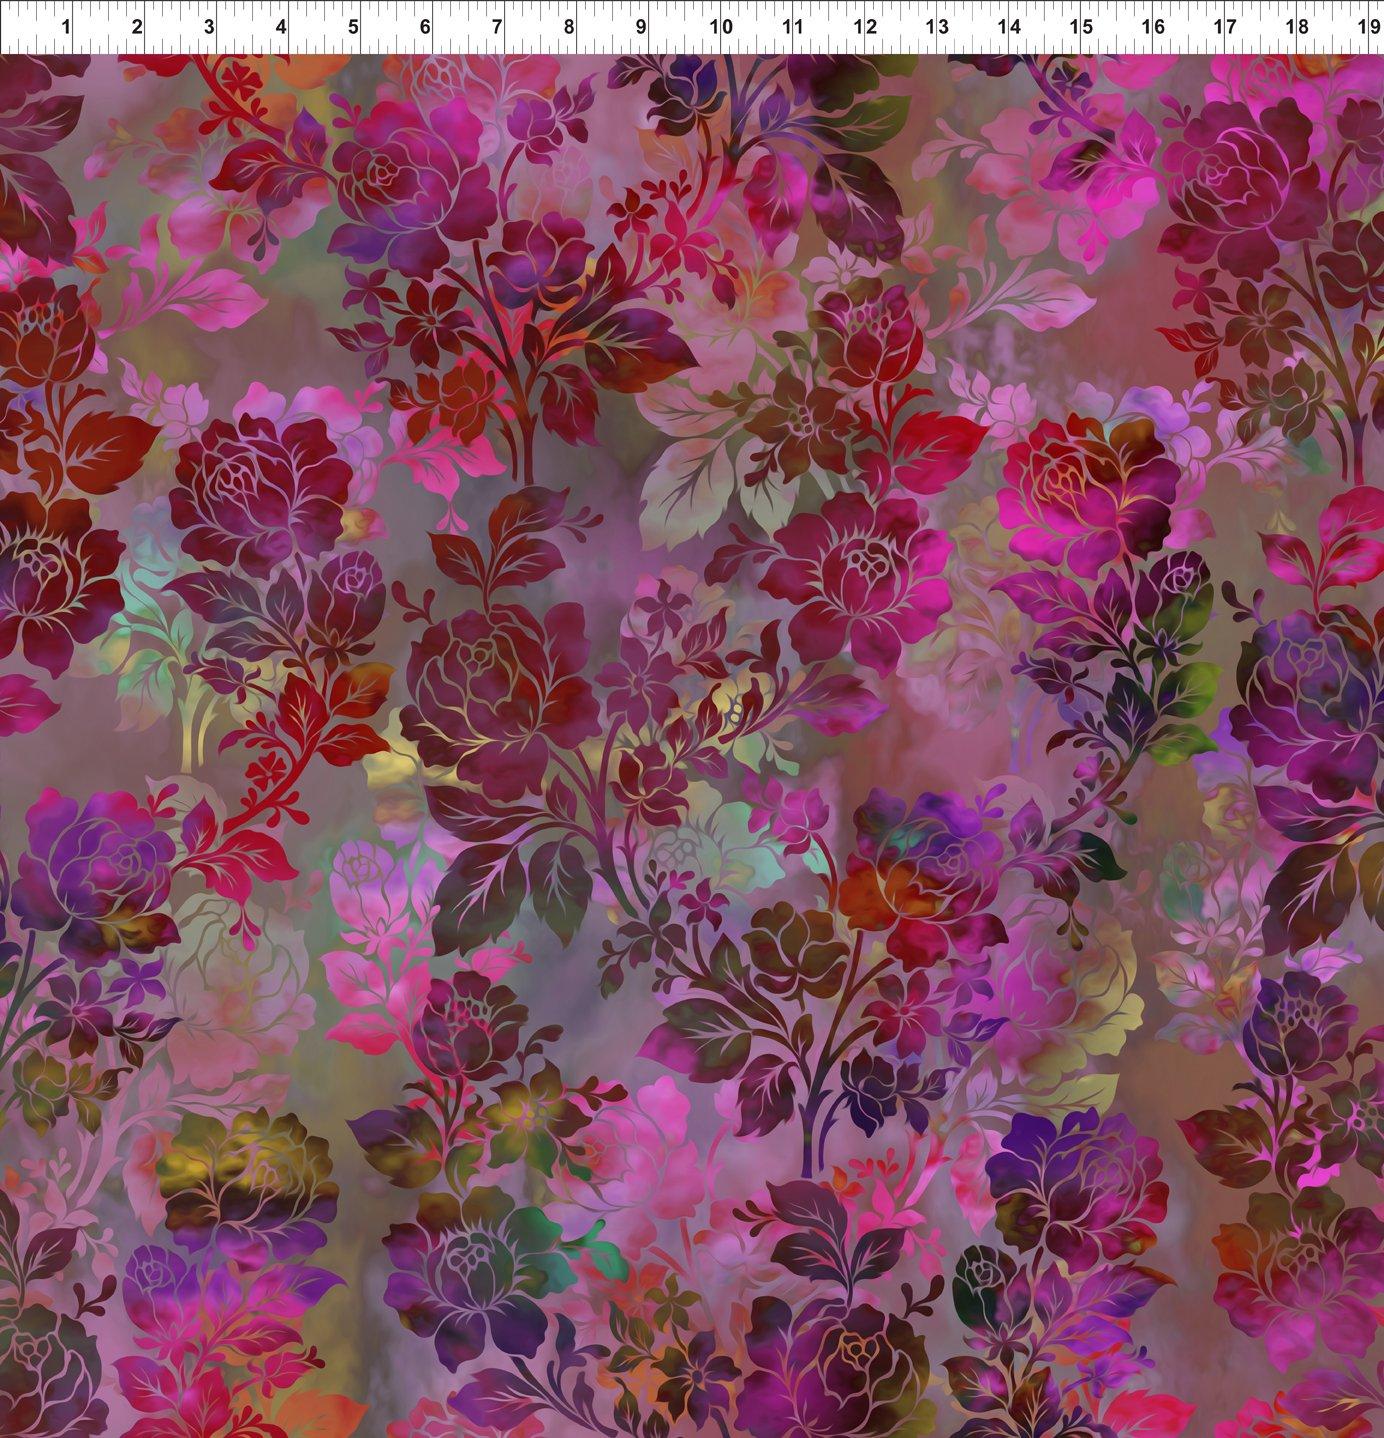 Diaphanous Night Bloom - Magenta